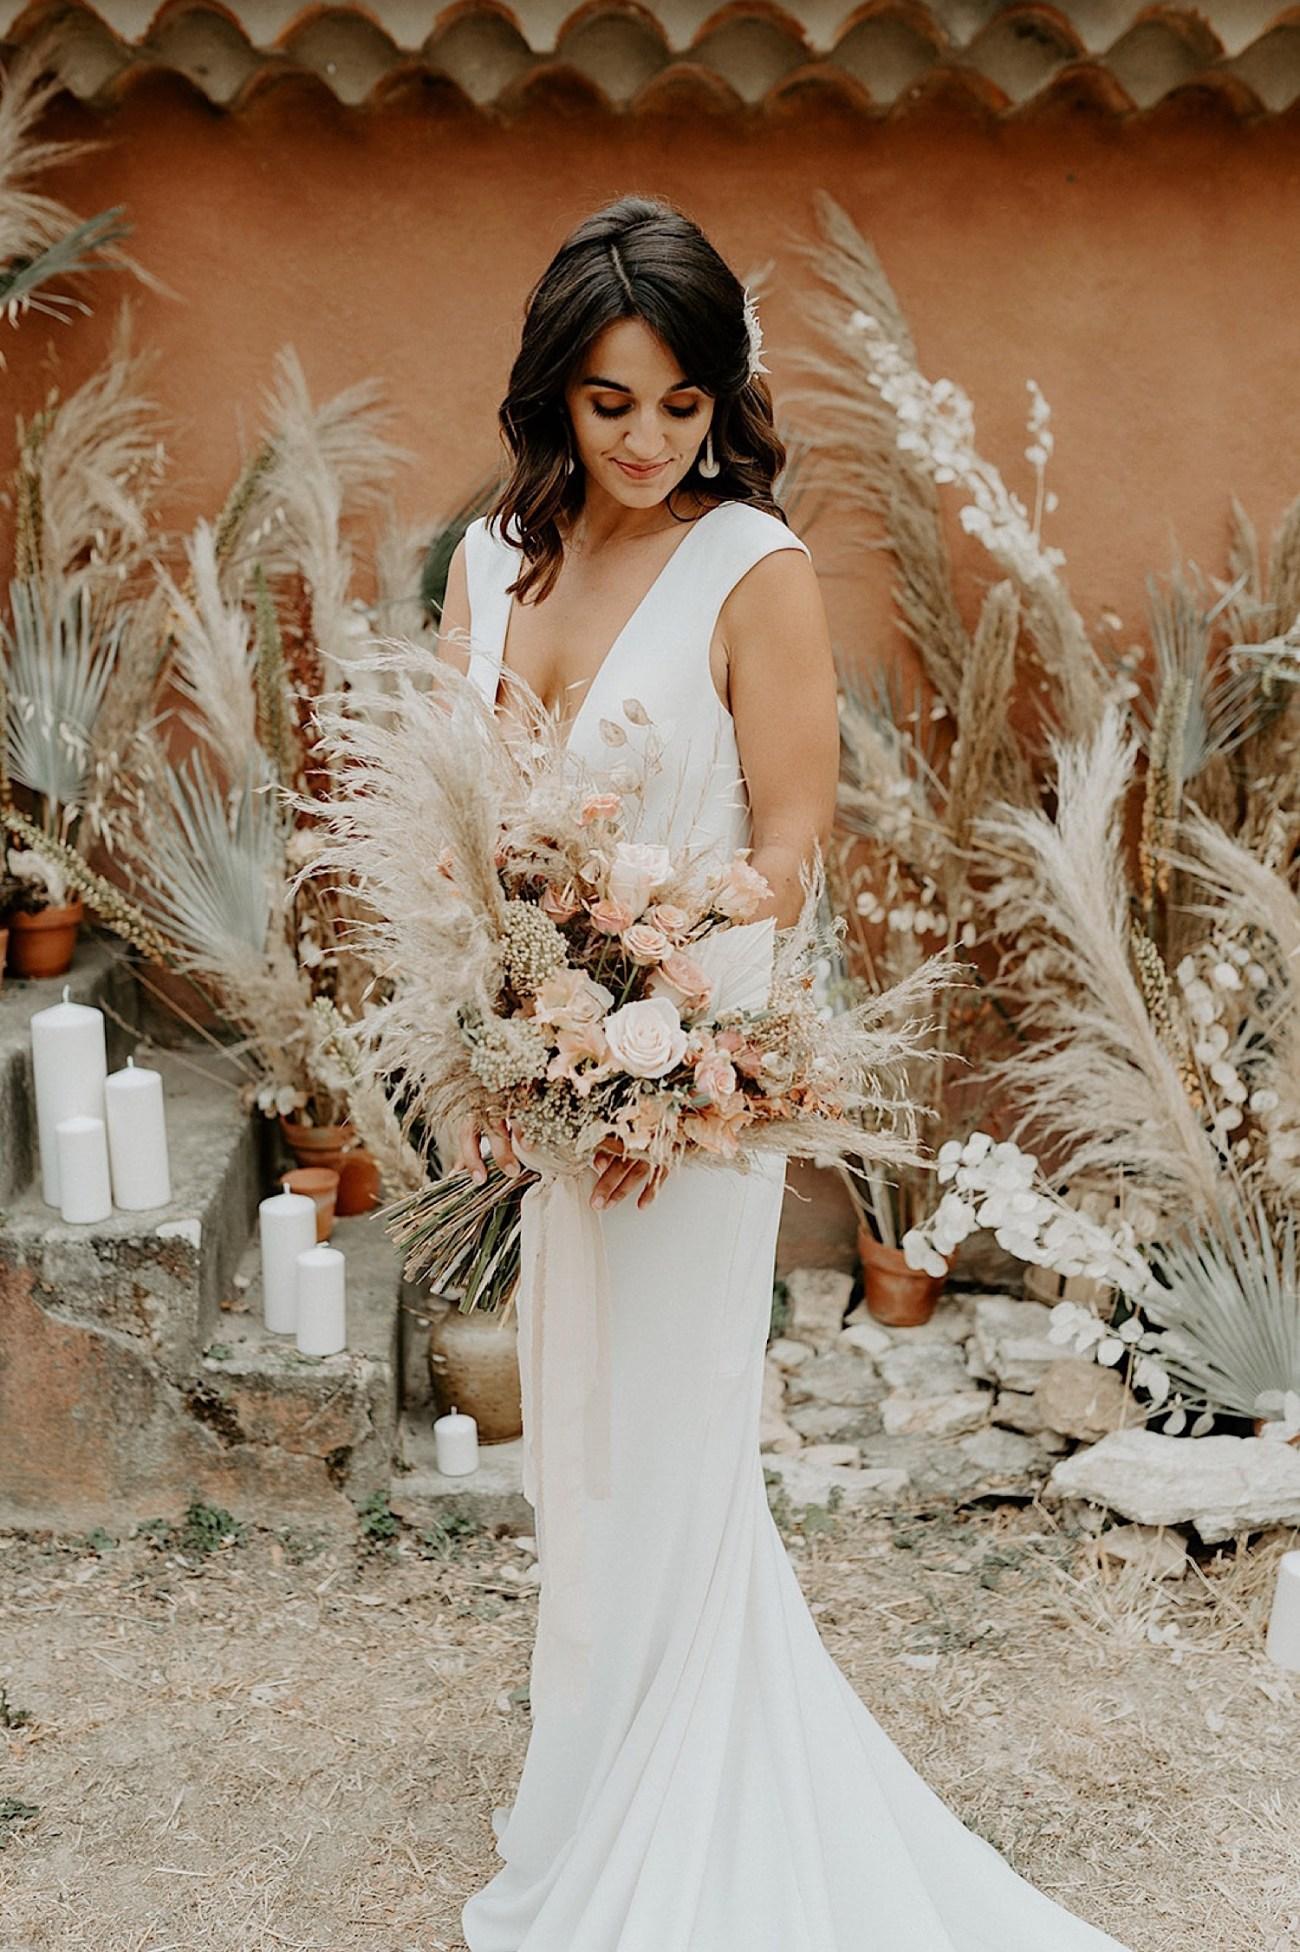 128 Terre Ugo Wedding Aix En Provence Wedding Destination Wedding France Provence Wedding Photographer Lavender Field Wedding Photos Valensole Wedding Photos